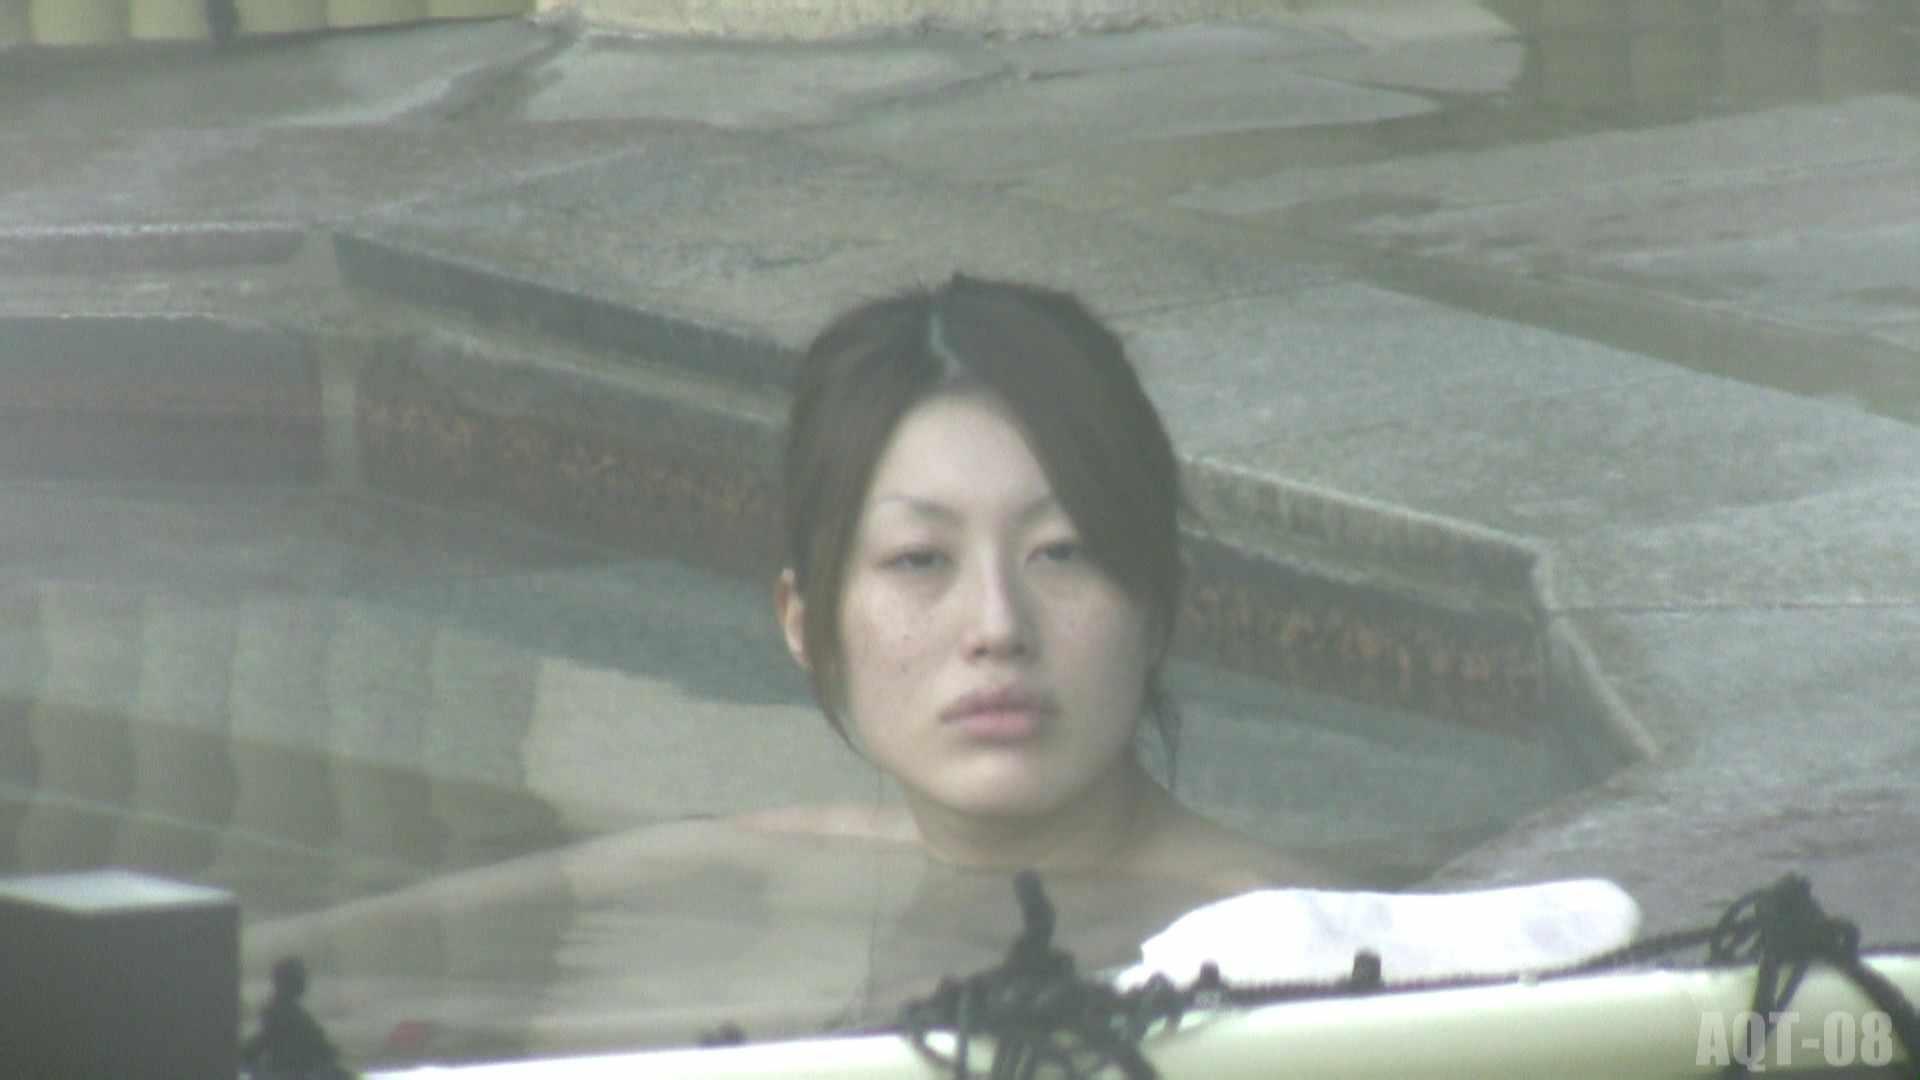 Aquaな露天風呂Vol.775 盗撮映像  74Pix 51